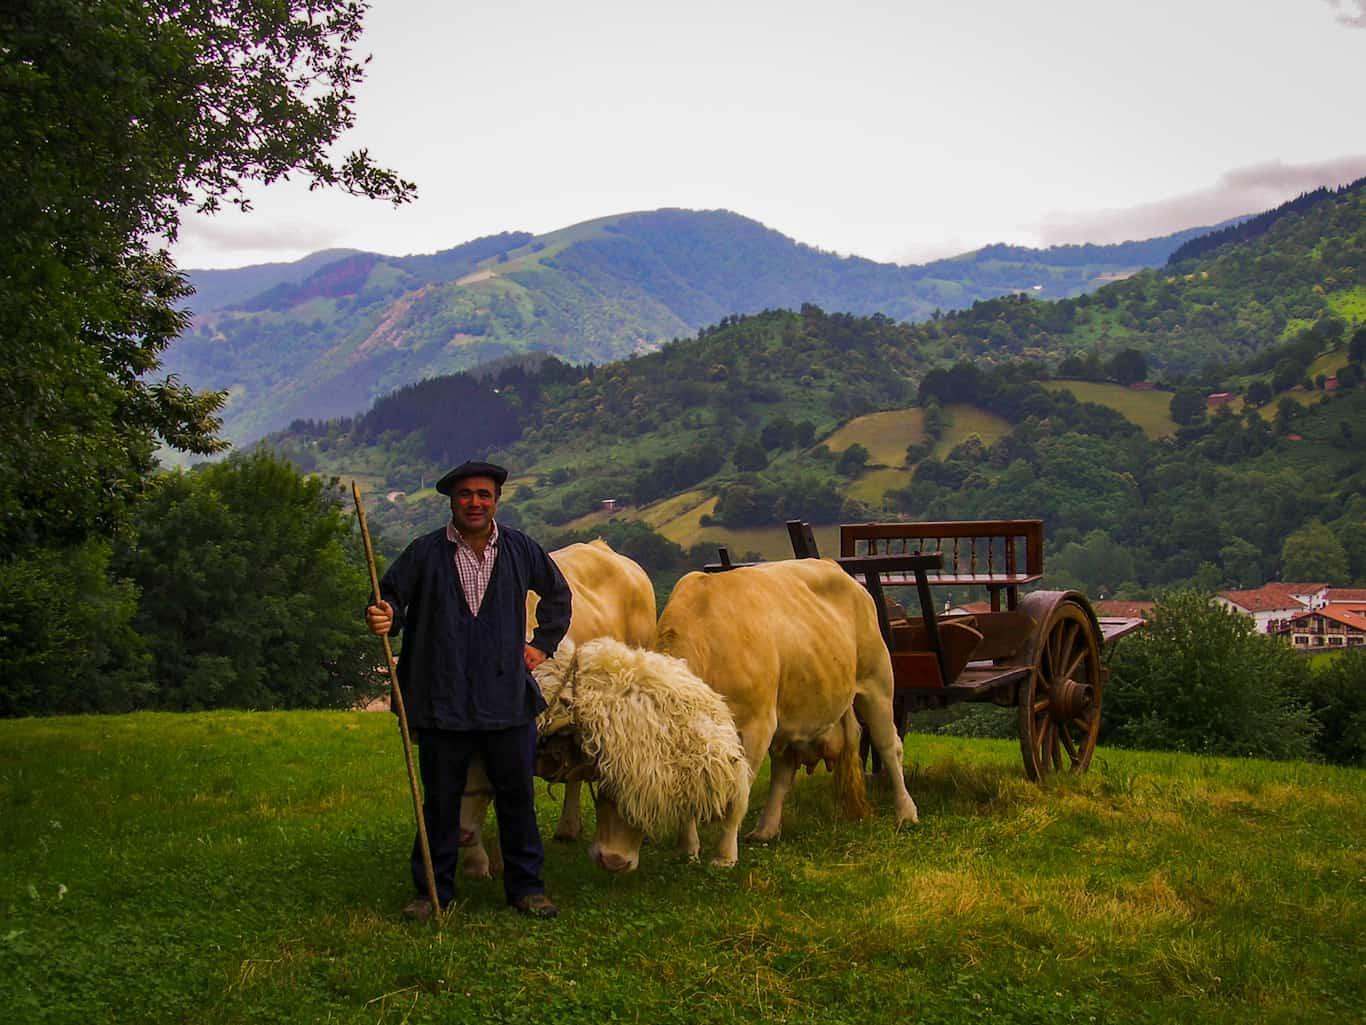 Basque ox and cart in Ituren